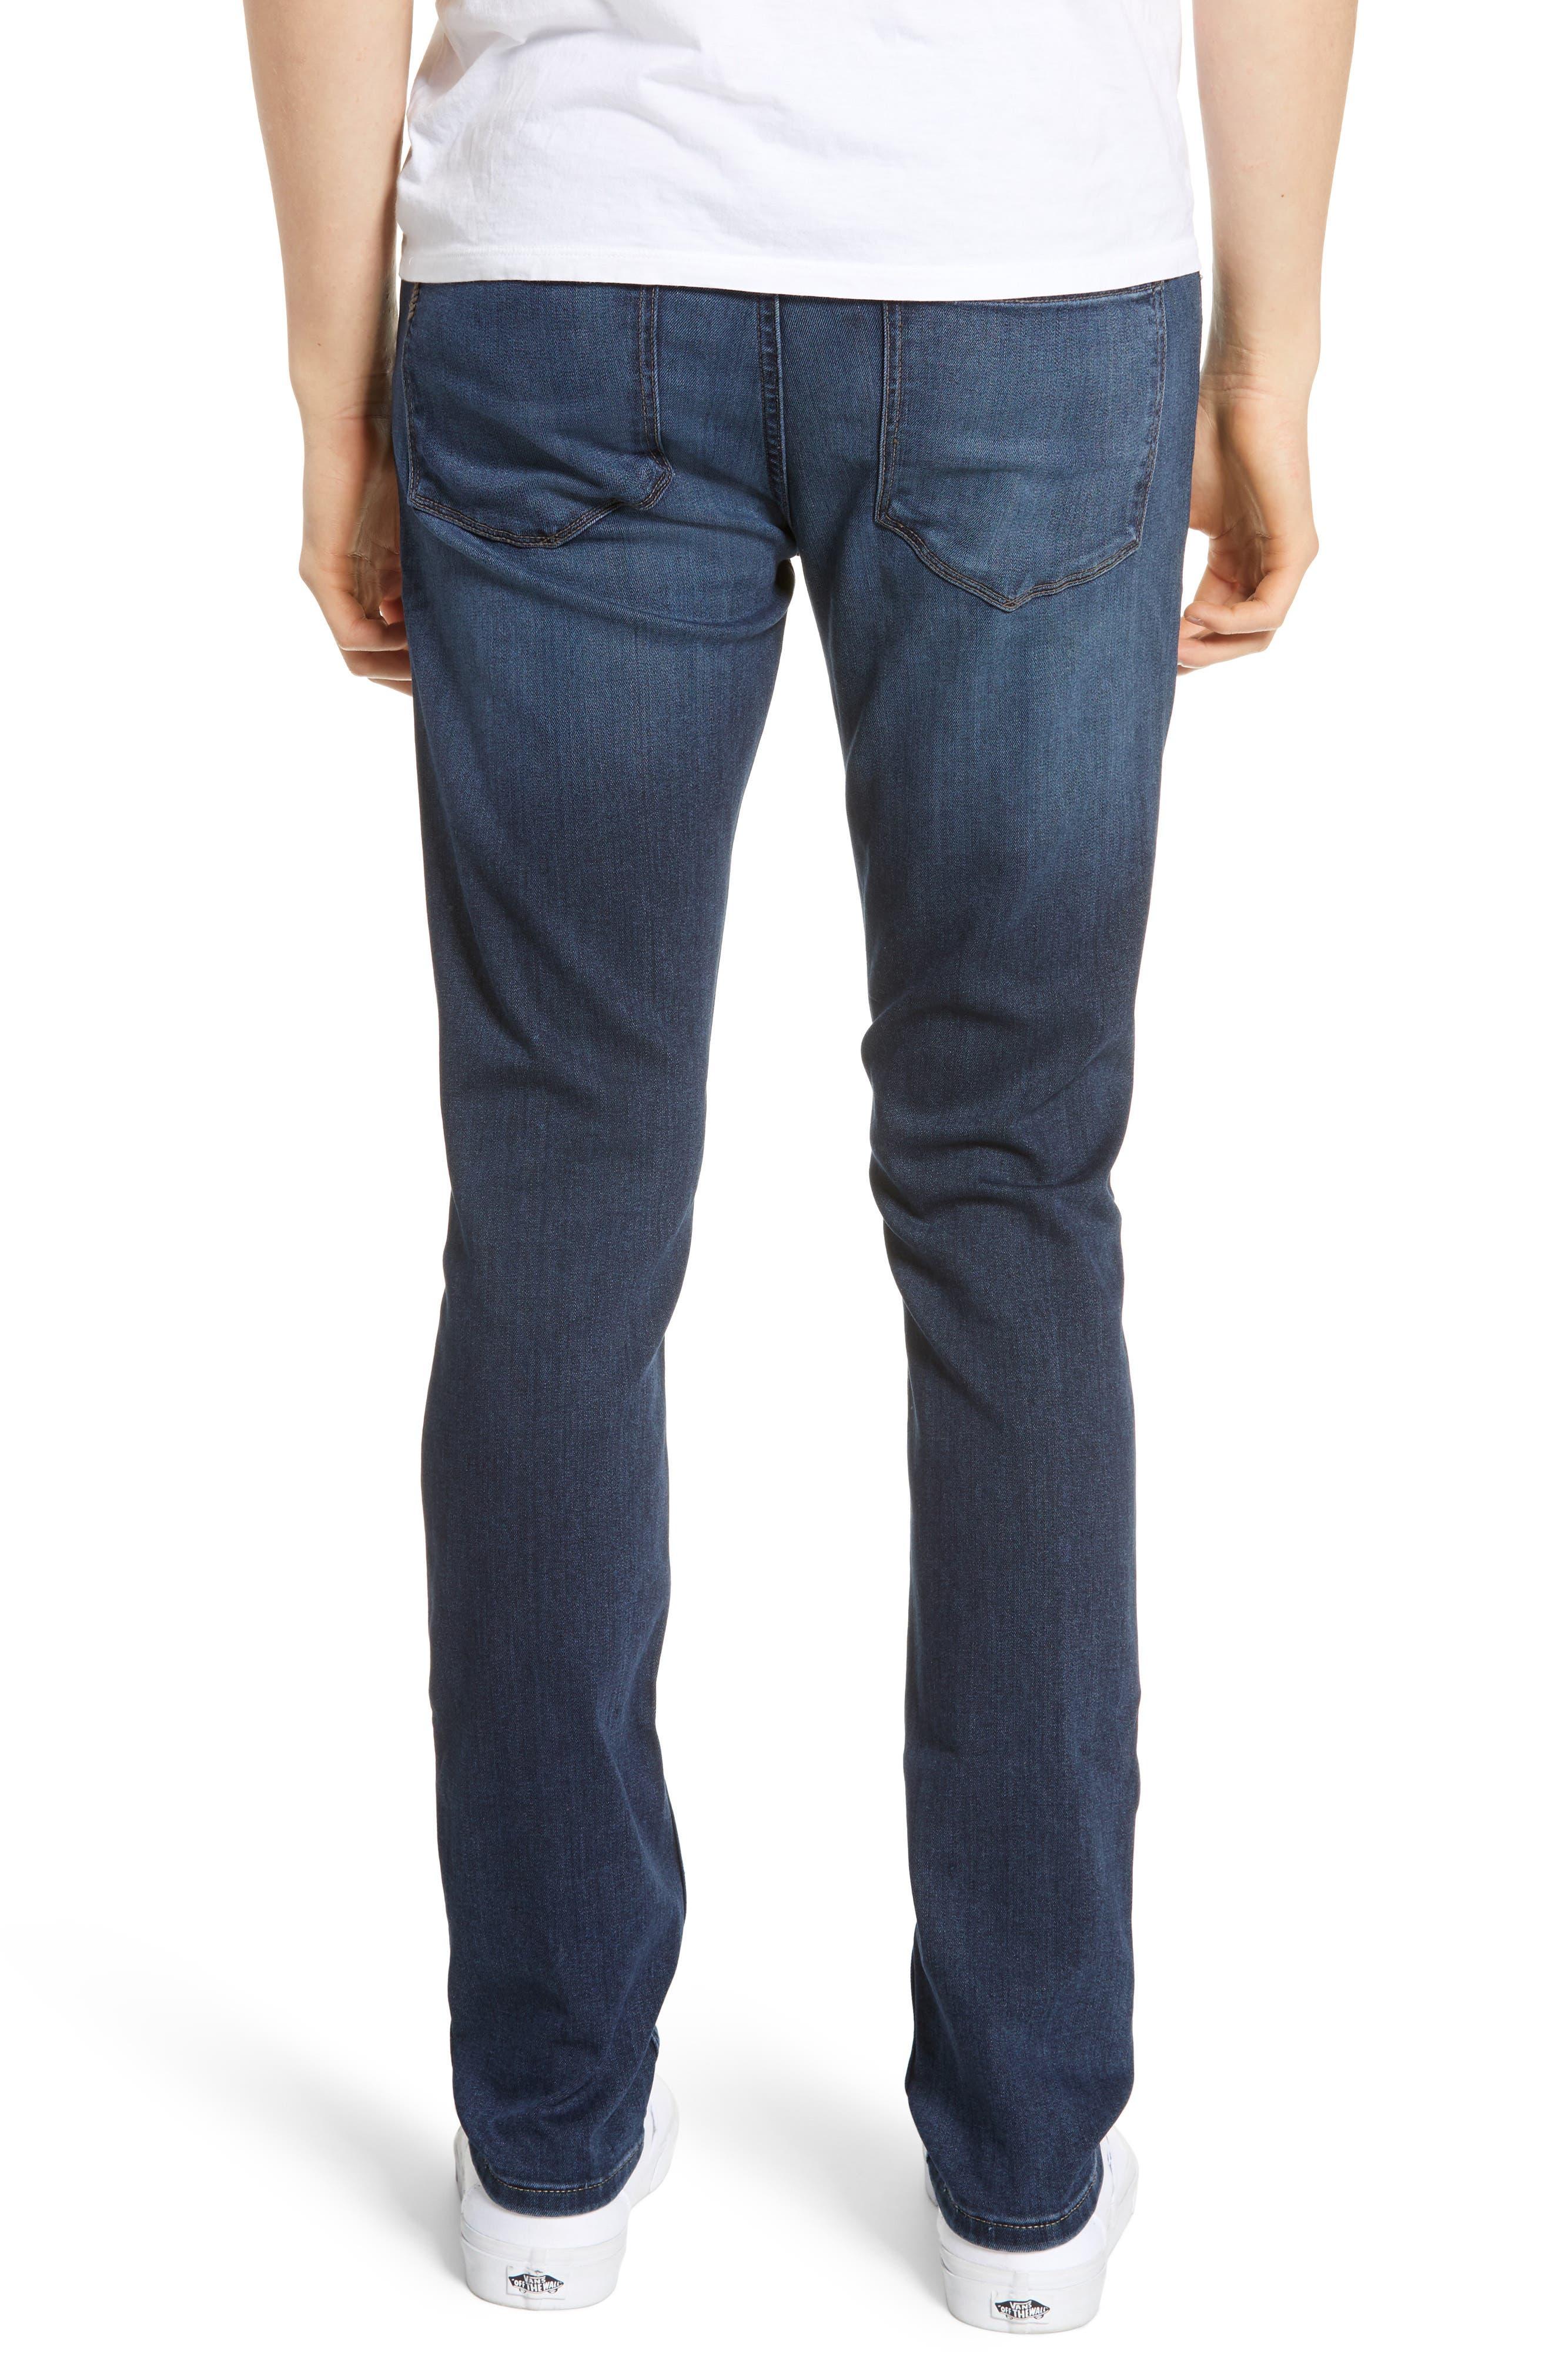 Transcend - Croft Skinny Fit Jeans,                             Alternate thumbnail 2, color,                             HUXLEY